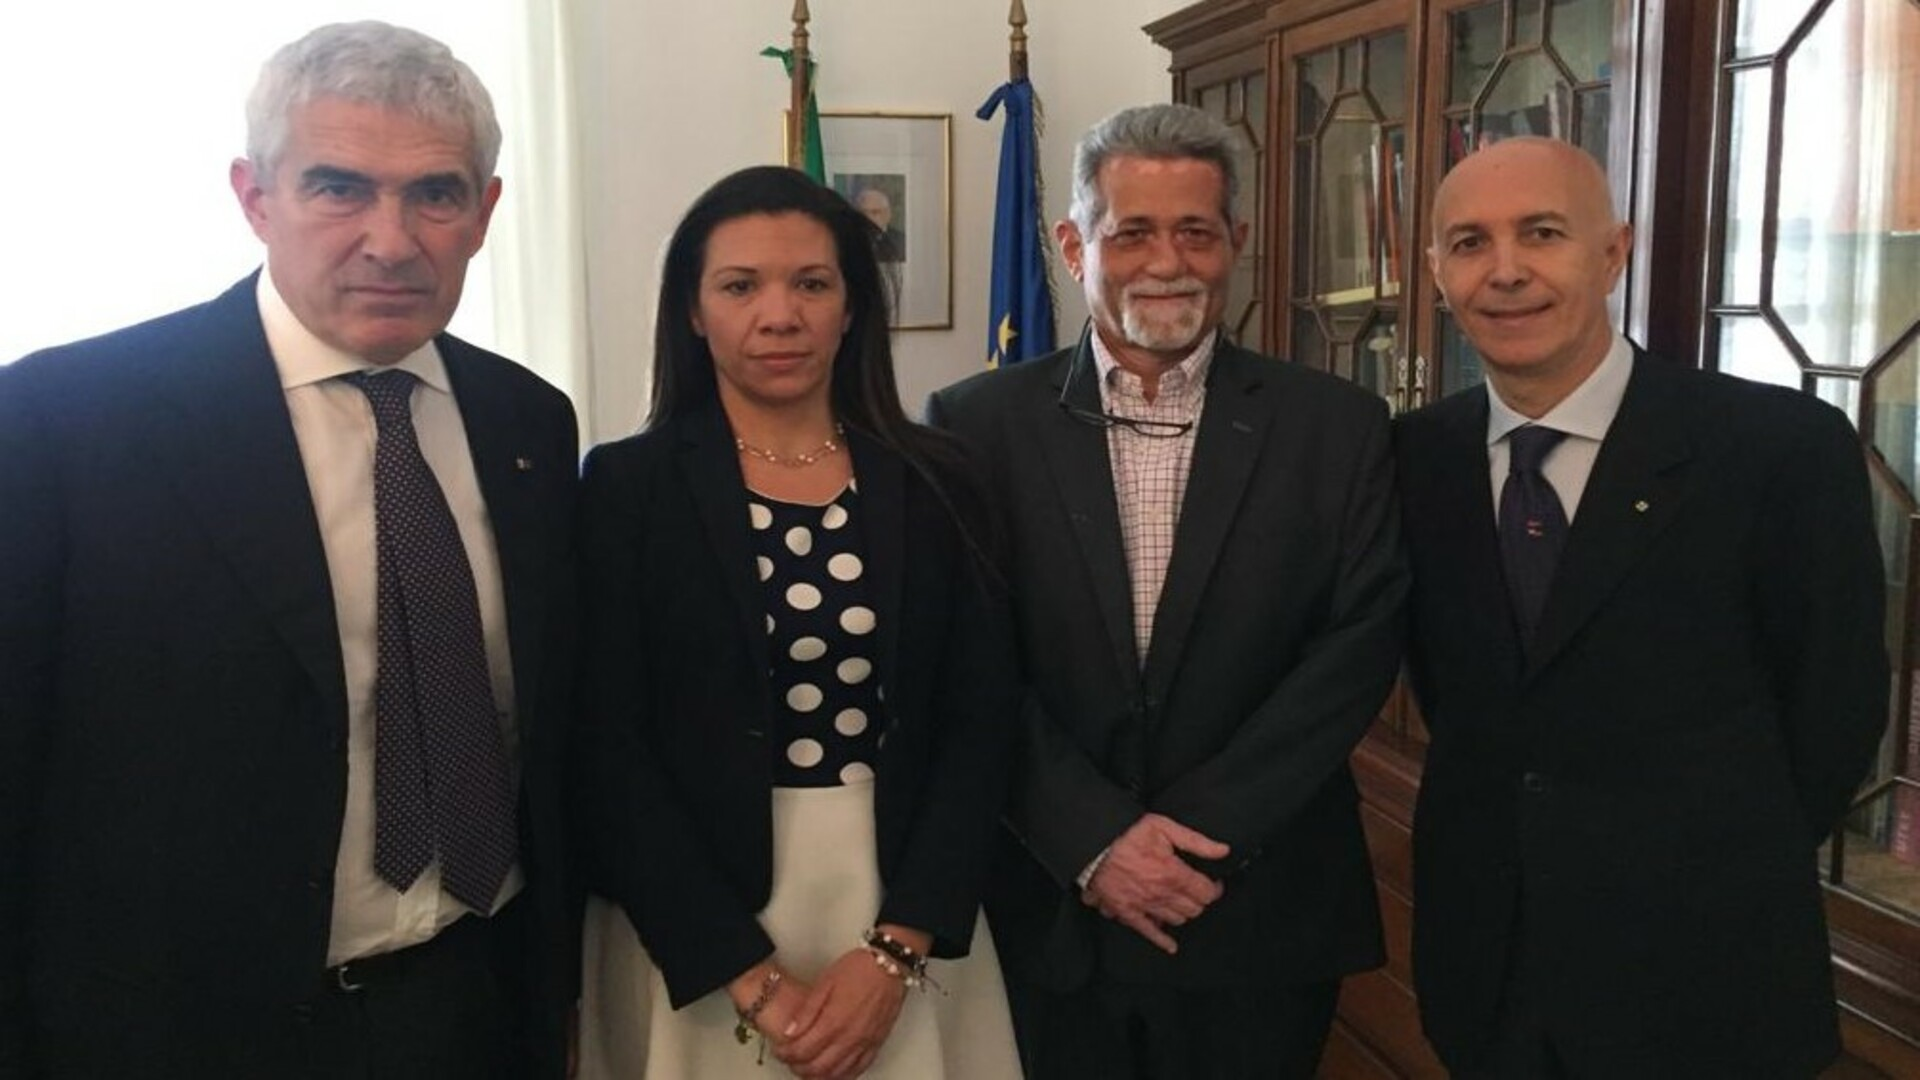 Diputados Américo De Grazia y Mariela Magallanes llegan a Italia luego de ser desterrados